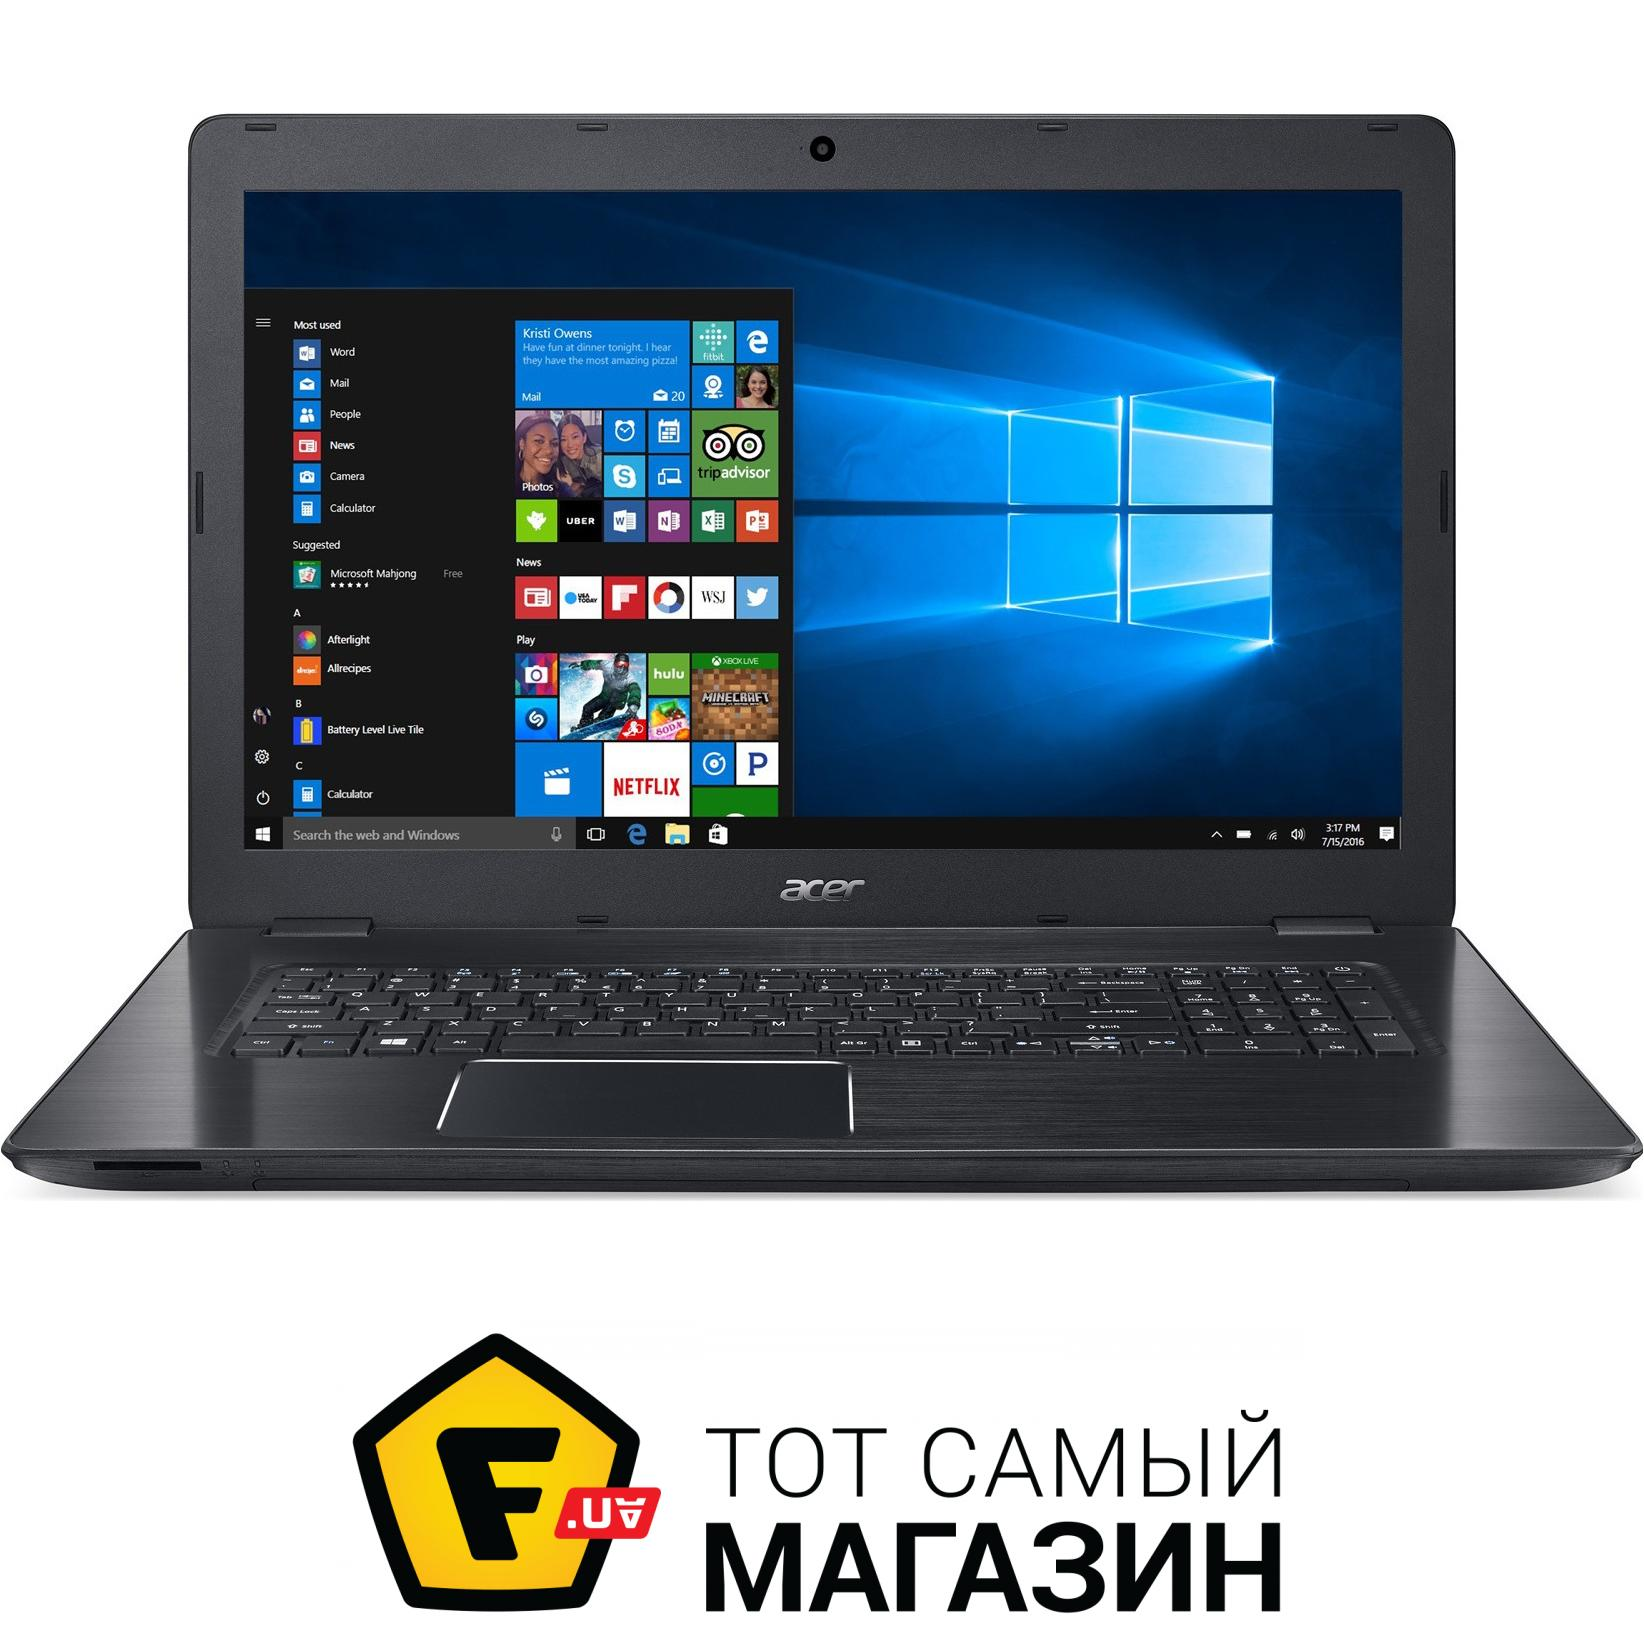 Ноутбук Dell XPS 13 9360-0001 (Intel Core i7-7500U 2.7GHz/16384Mb/512Gb SSD/No ODD/Intel HD Graphics/Wi-Fi/Bluetooth/Cam/13.3/3200x1800/Touchscreen/Windows 10 64-bit)